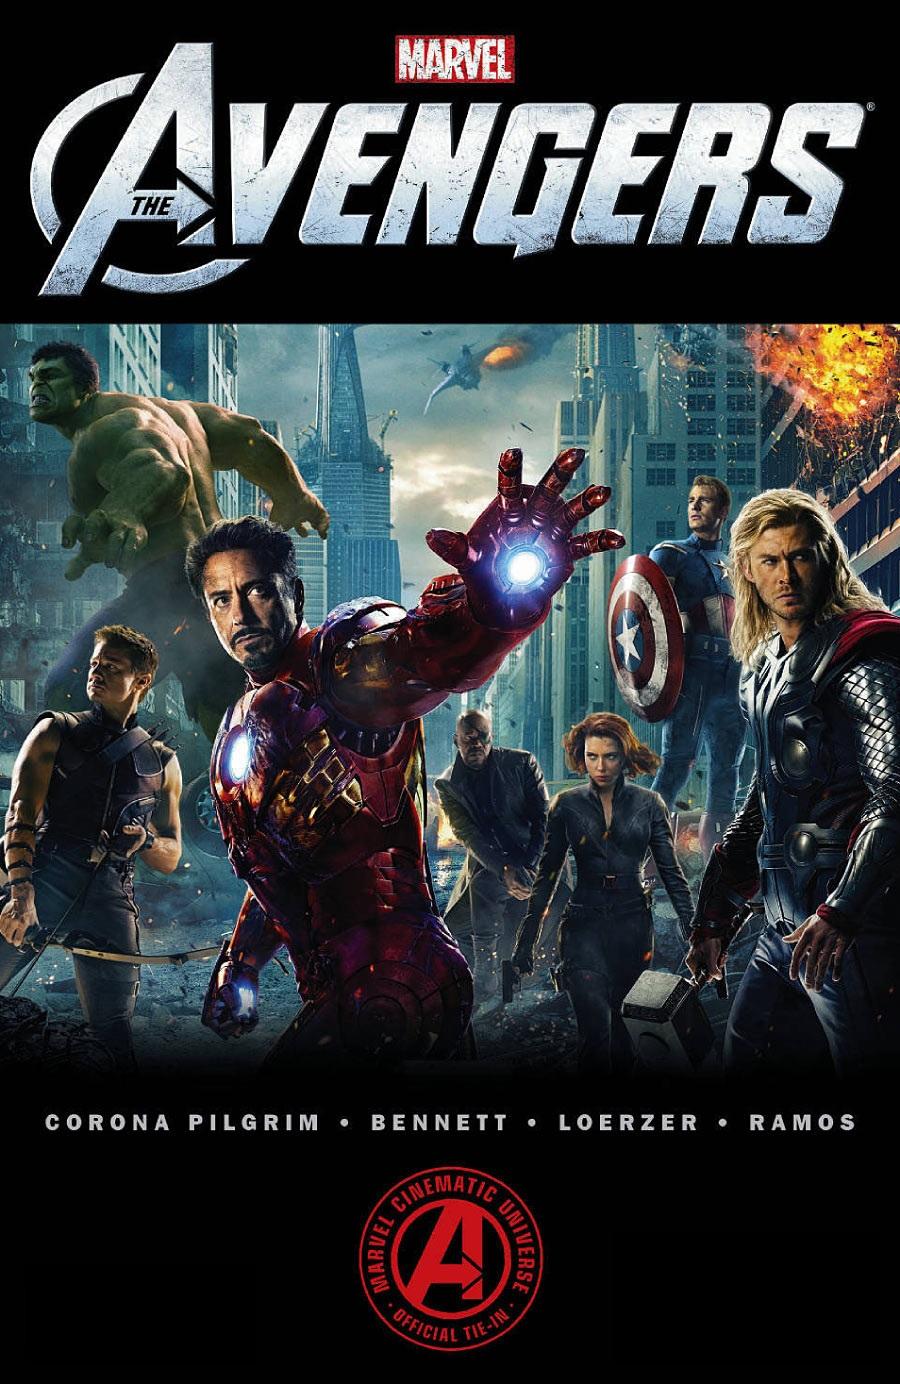 the avengers adaptation - The Avengers